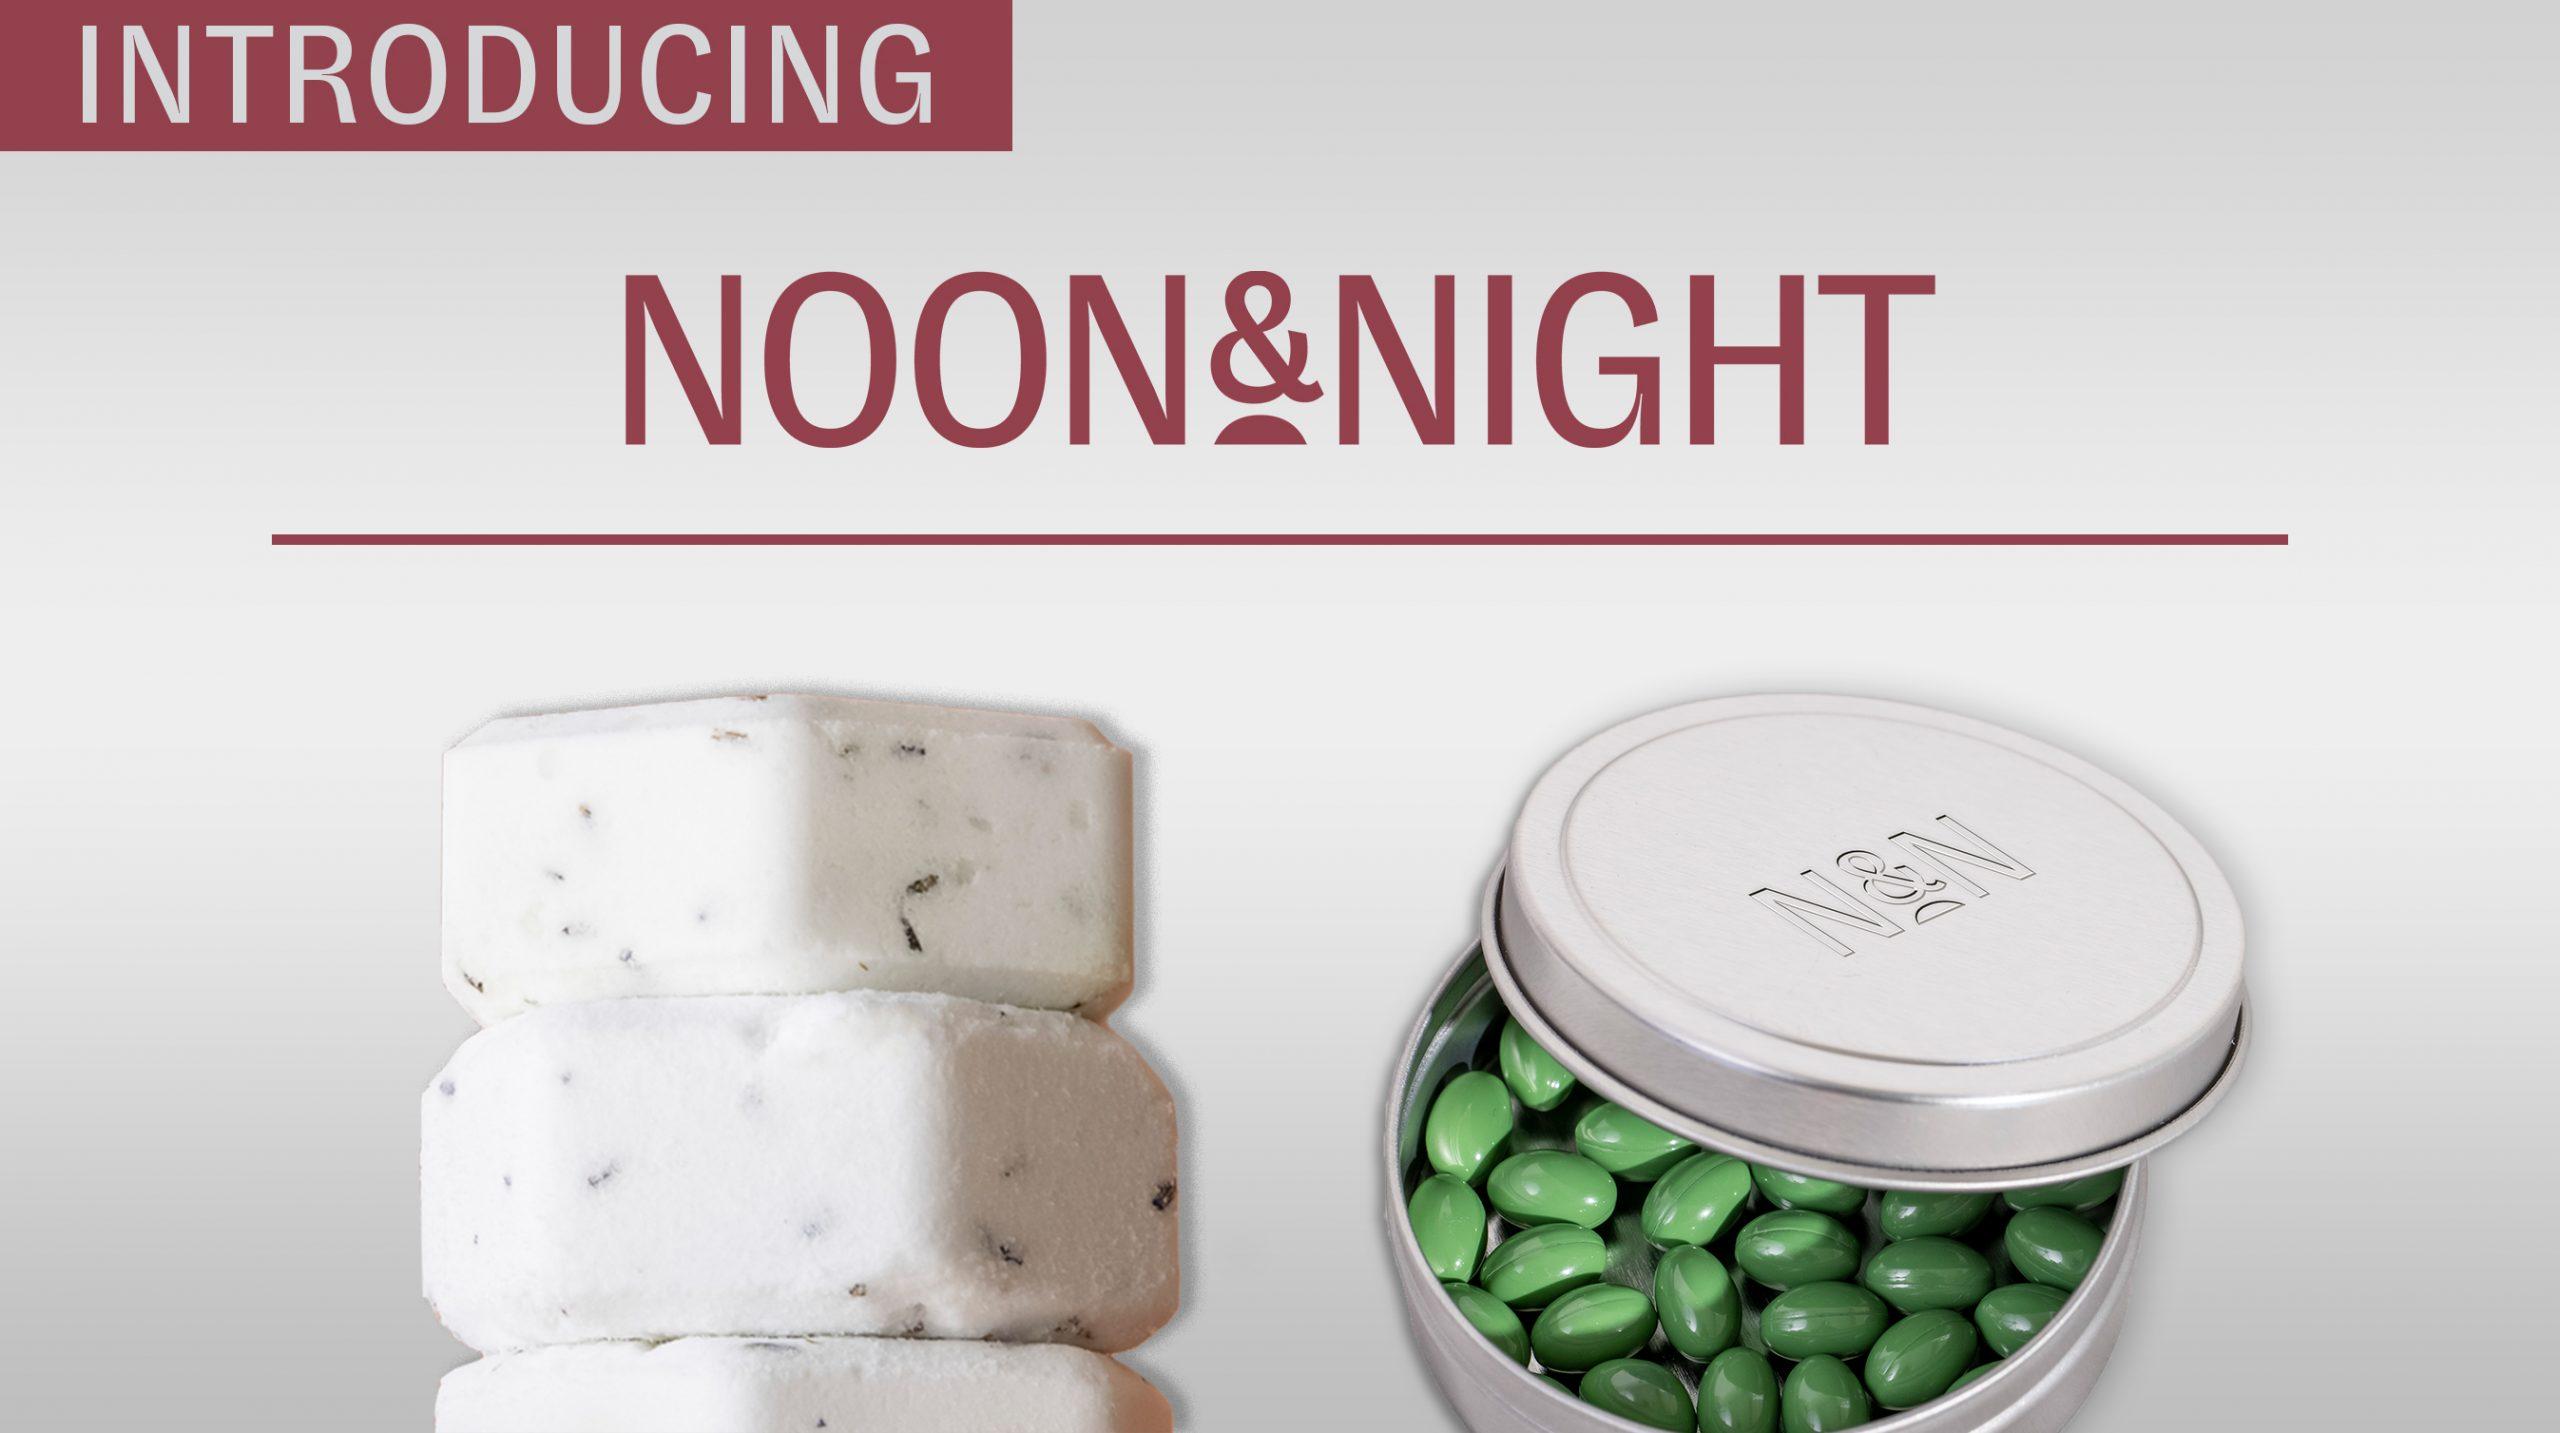 Aleafia Health Introduces Wellness Brand Noon & Night Featuring Omega CBD Soft Gels